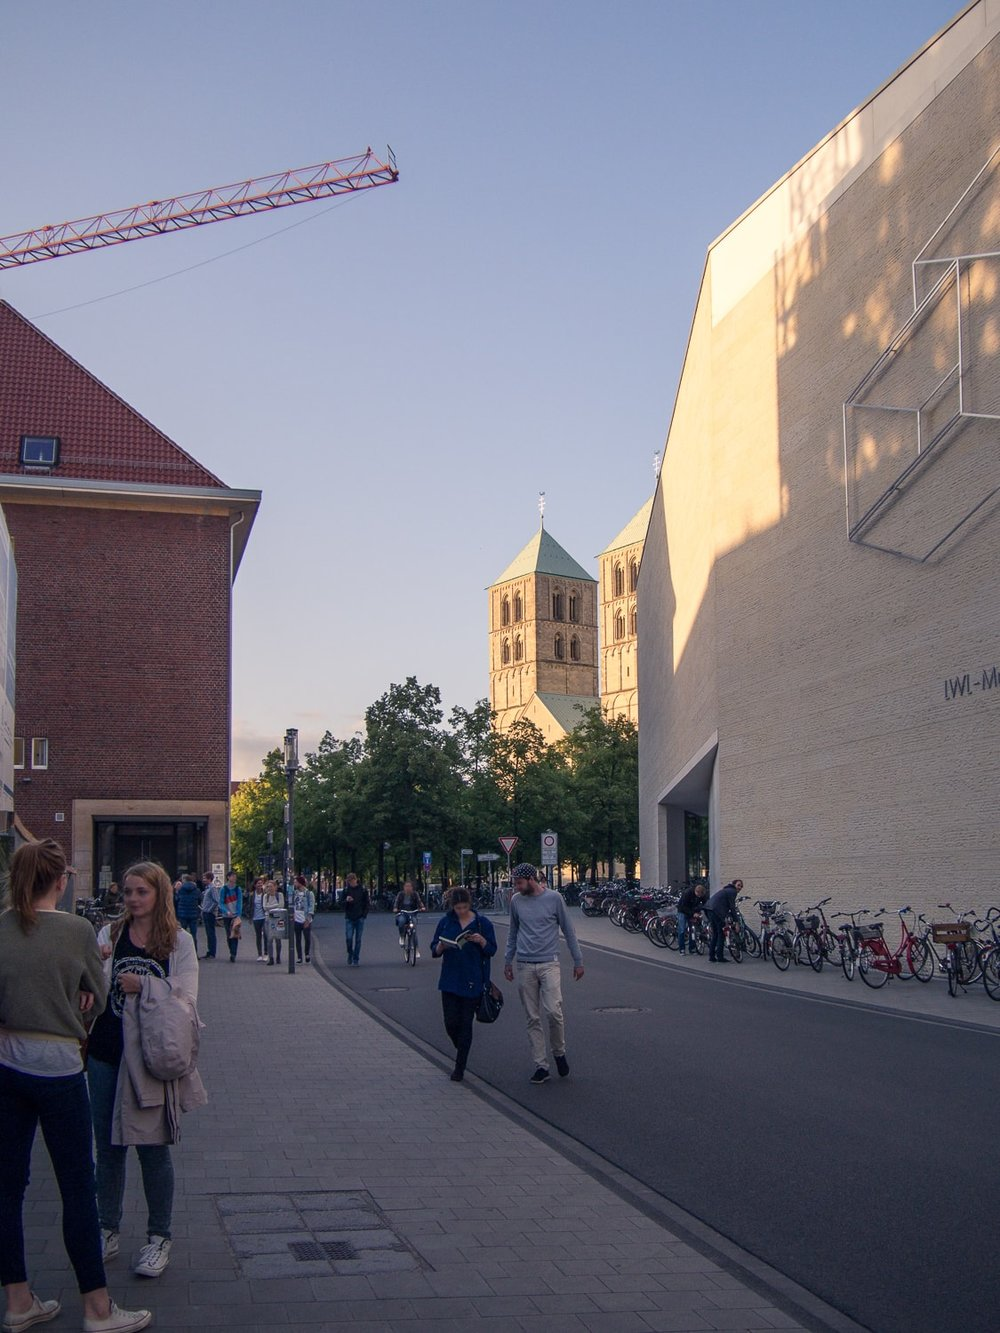 07.09.19.34.44 - LWL Museum Muenster.jpg